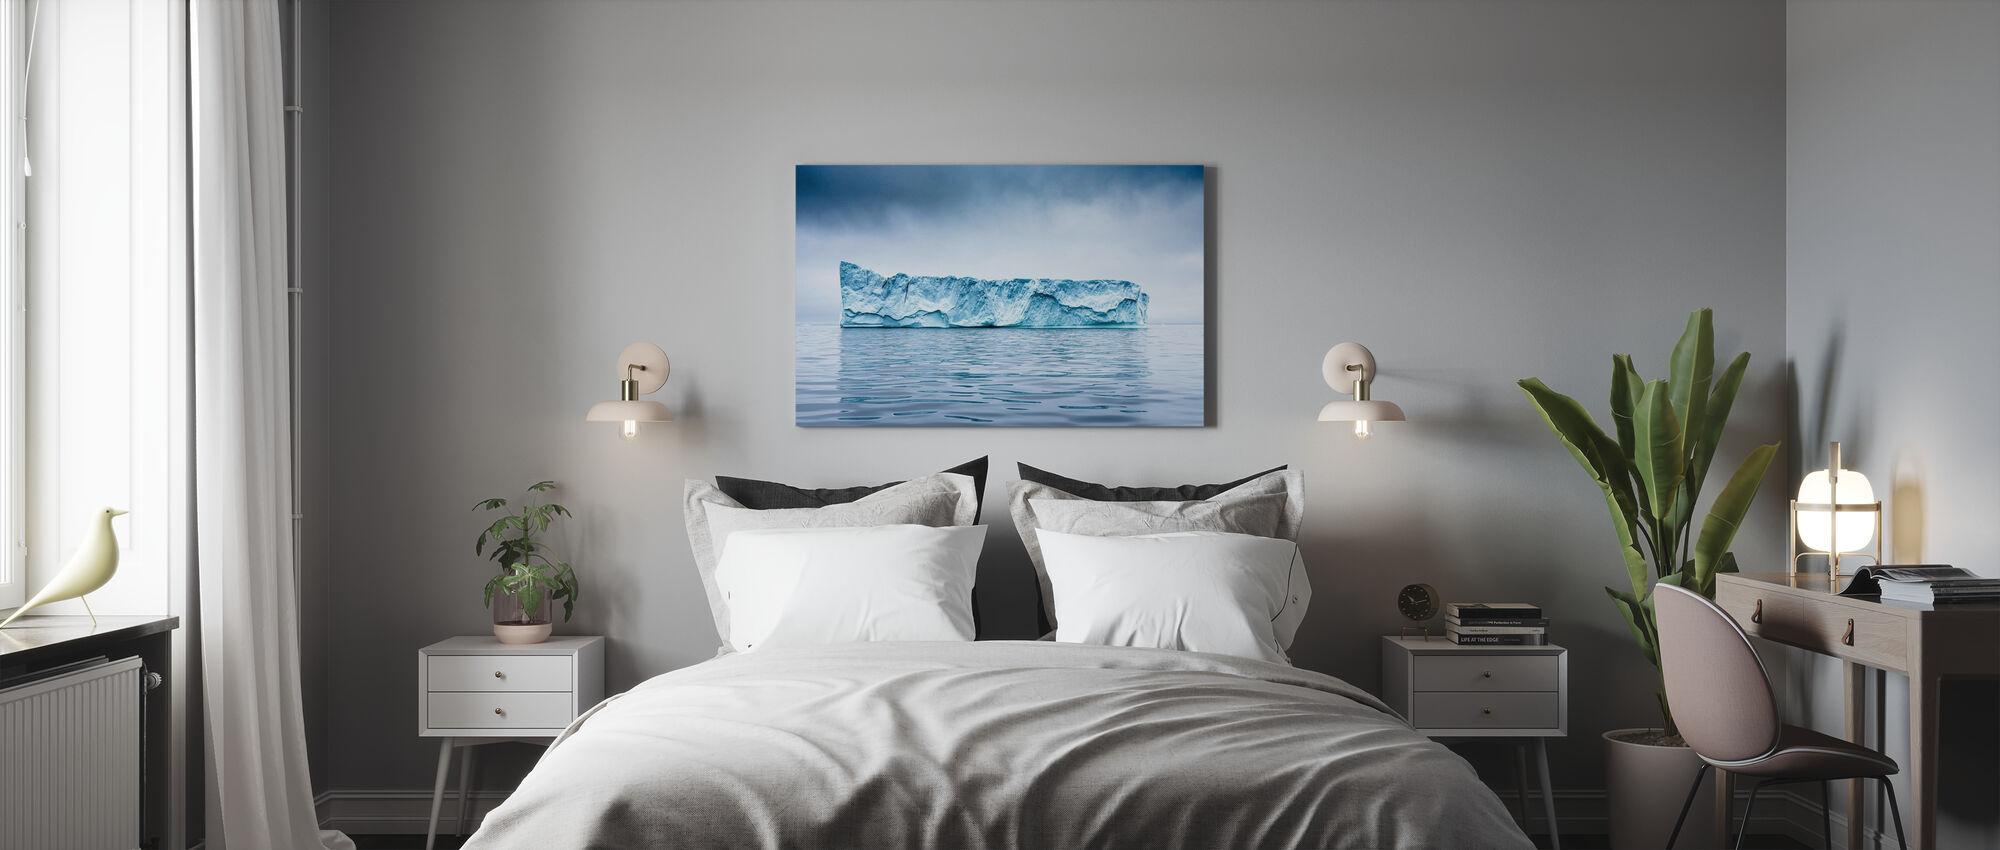 Rothko Mountain - Canvas print - Bedroom